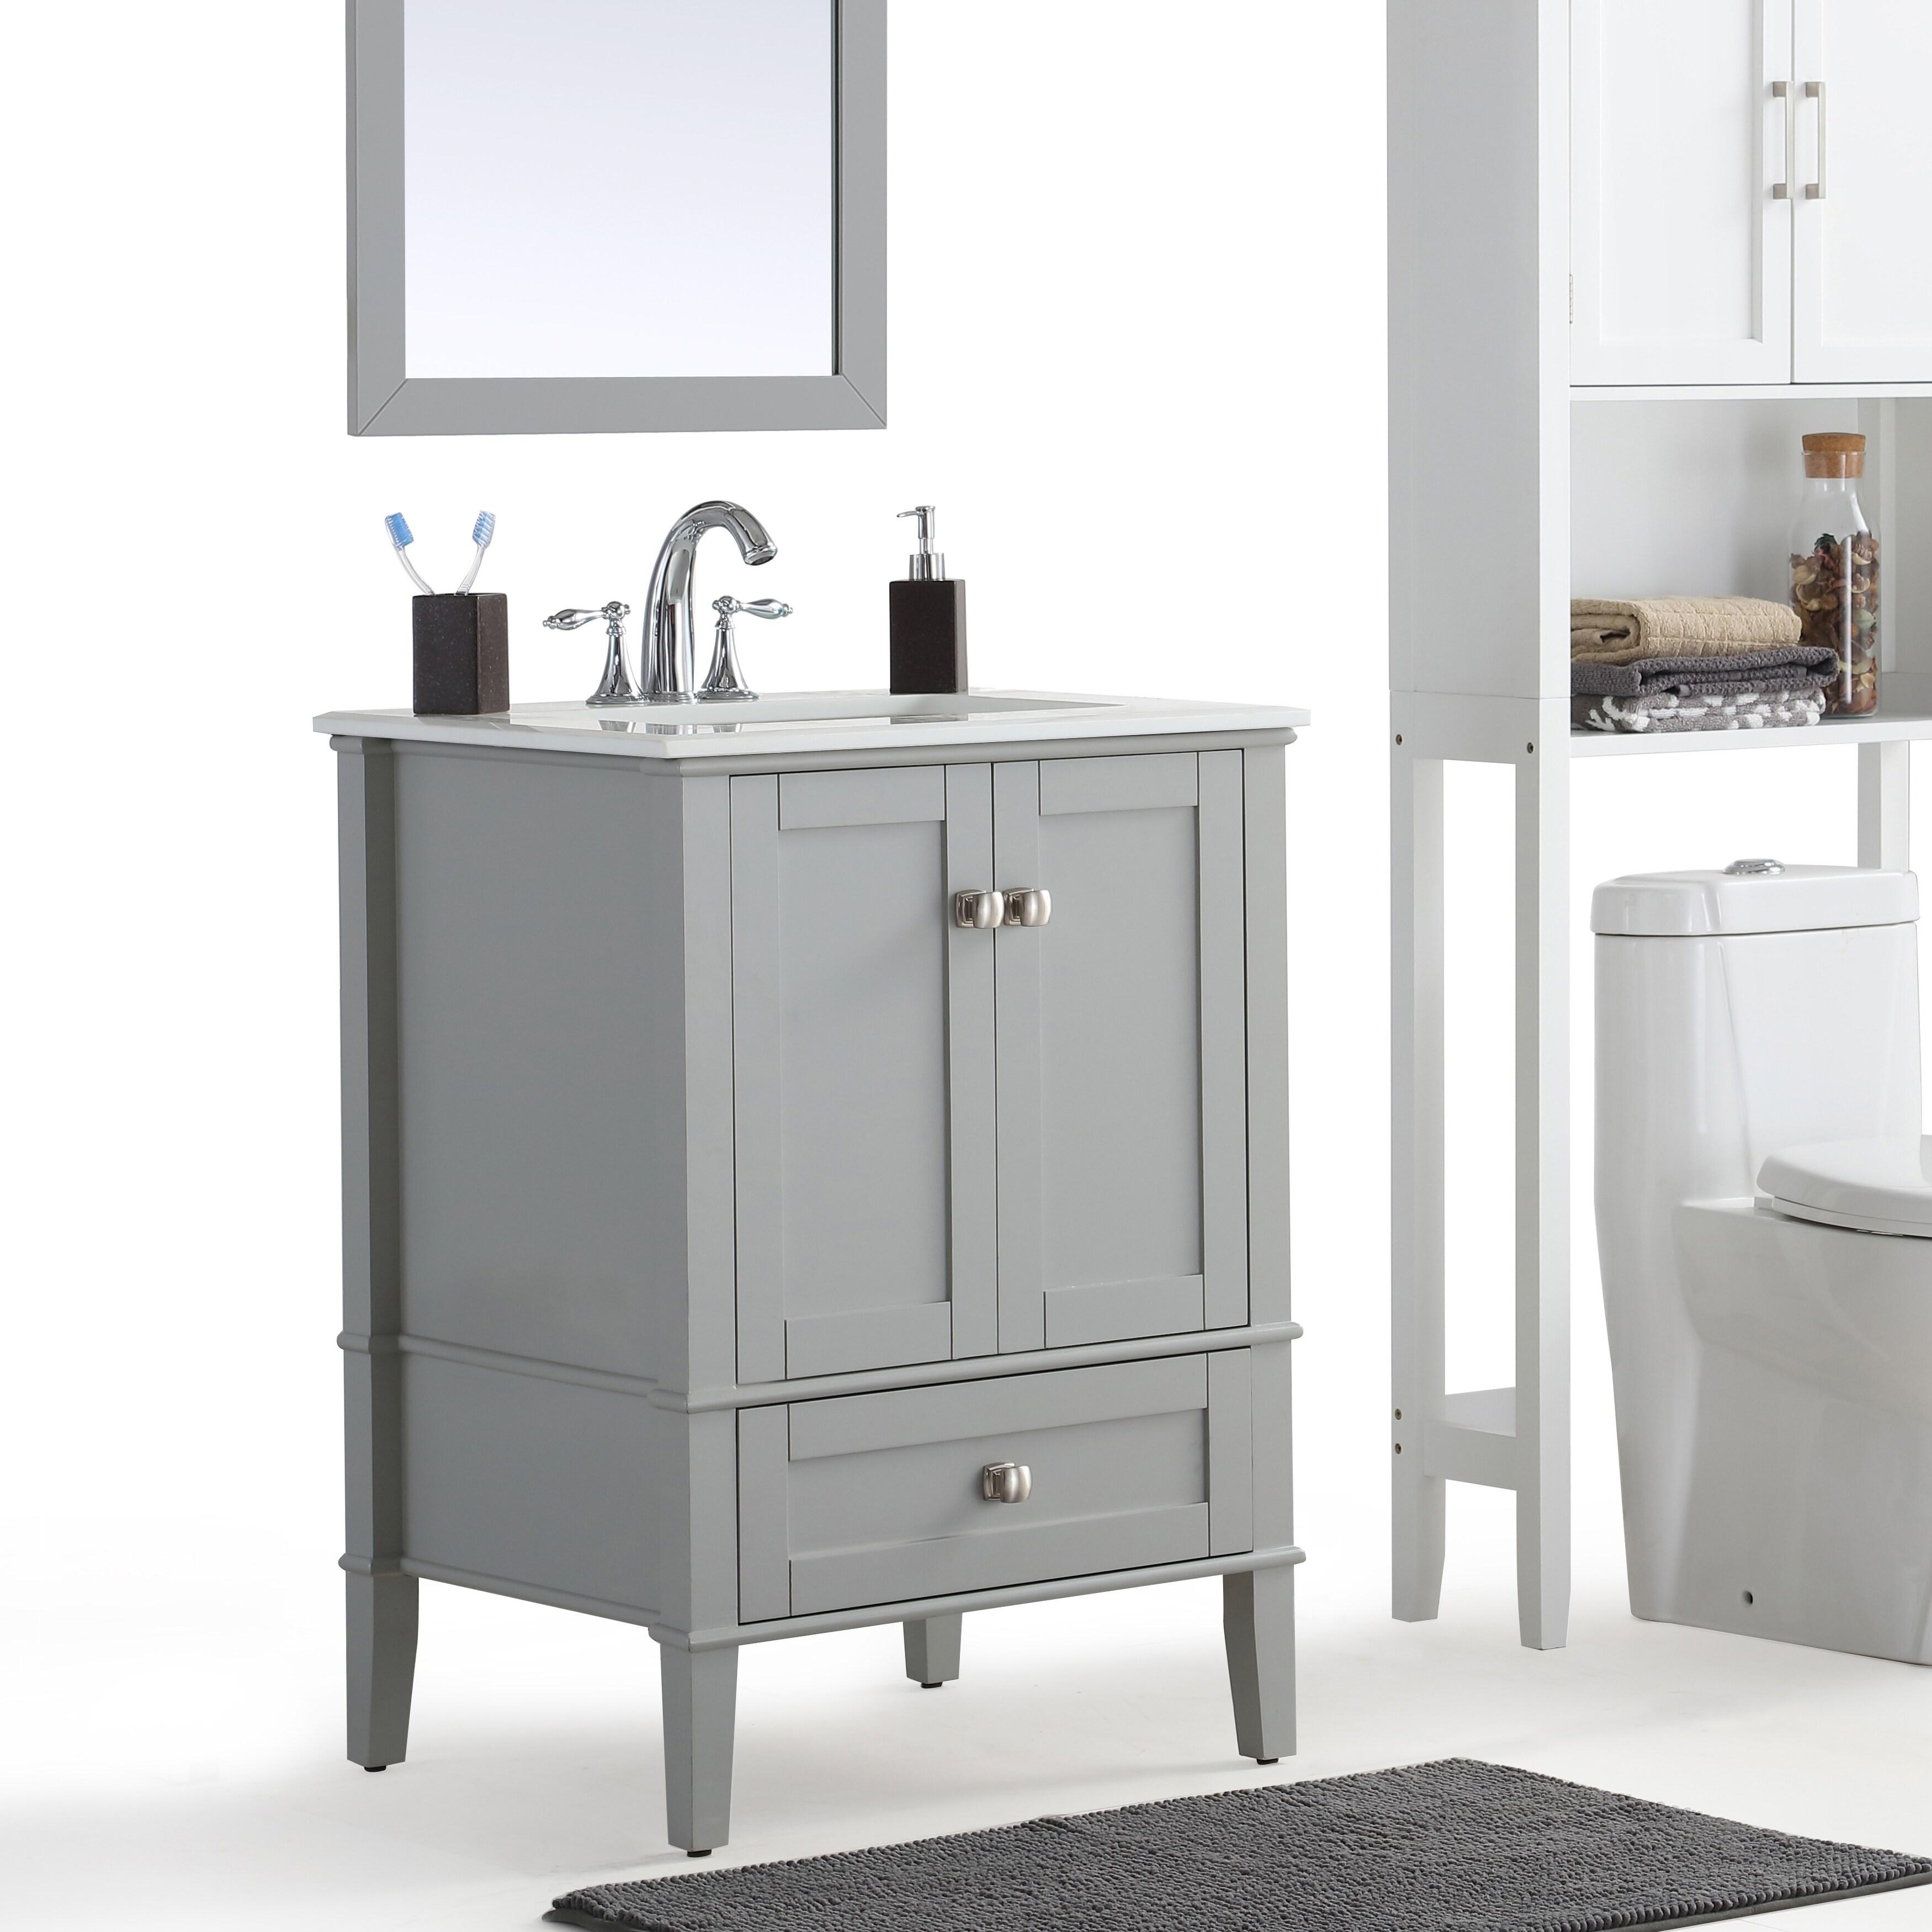 Buy Transitional Bathroom Vanities & Vanity Cabinets Online at ...